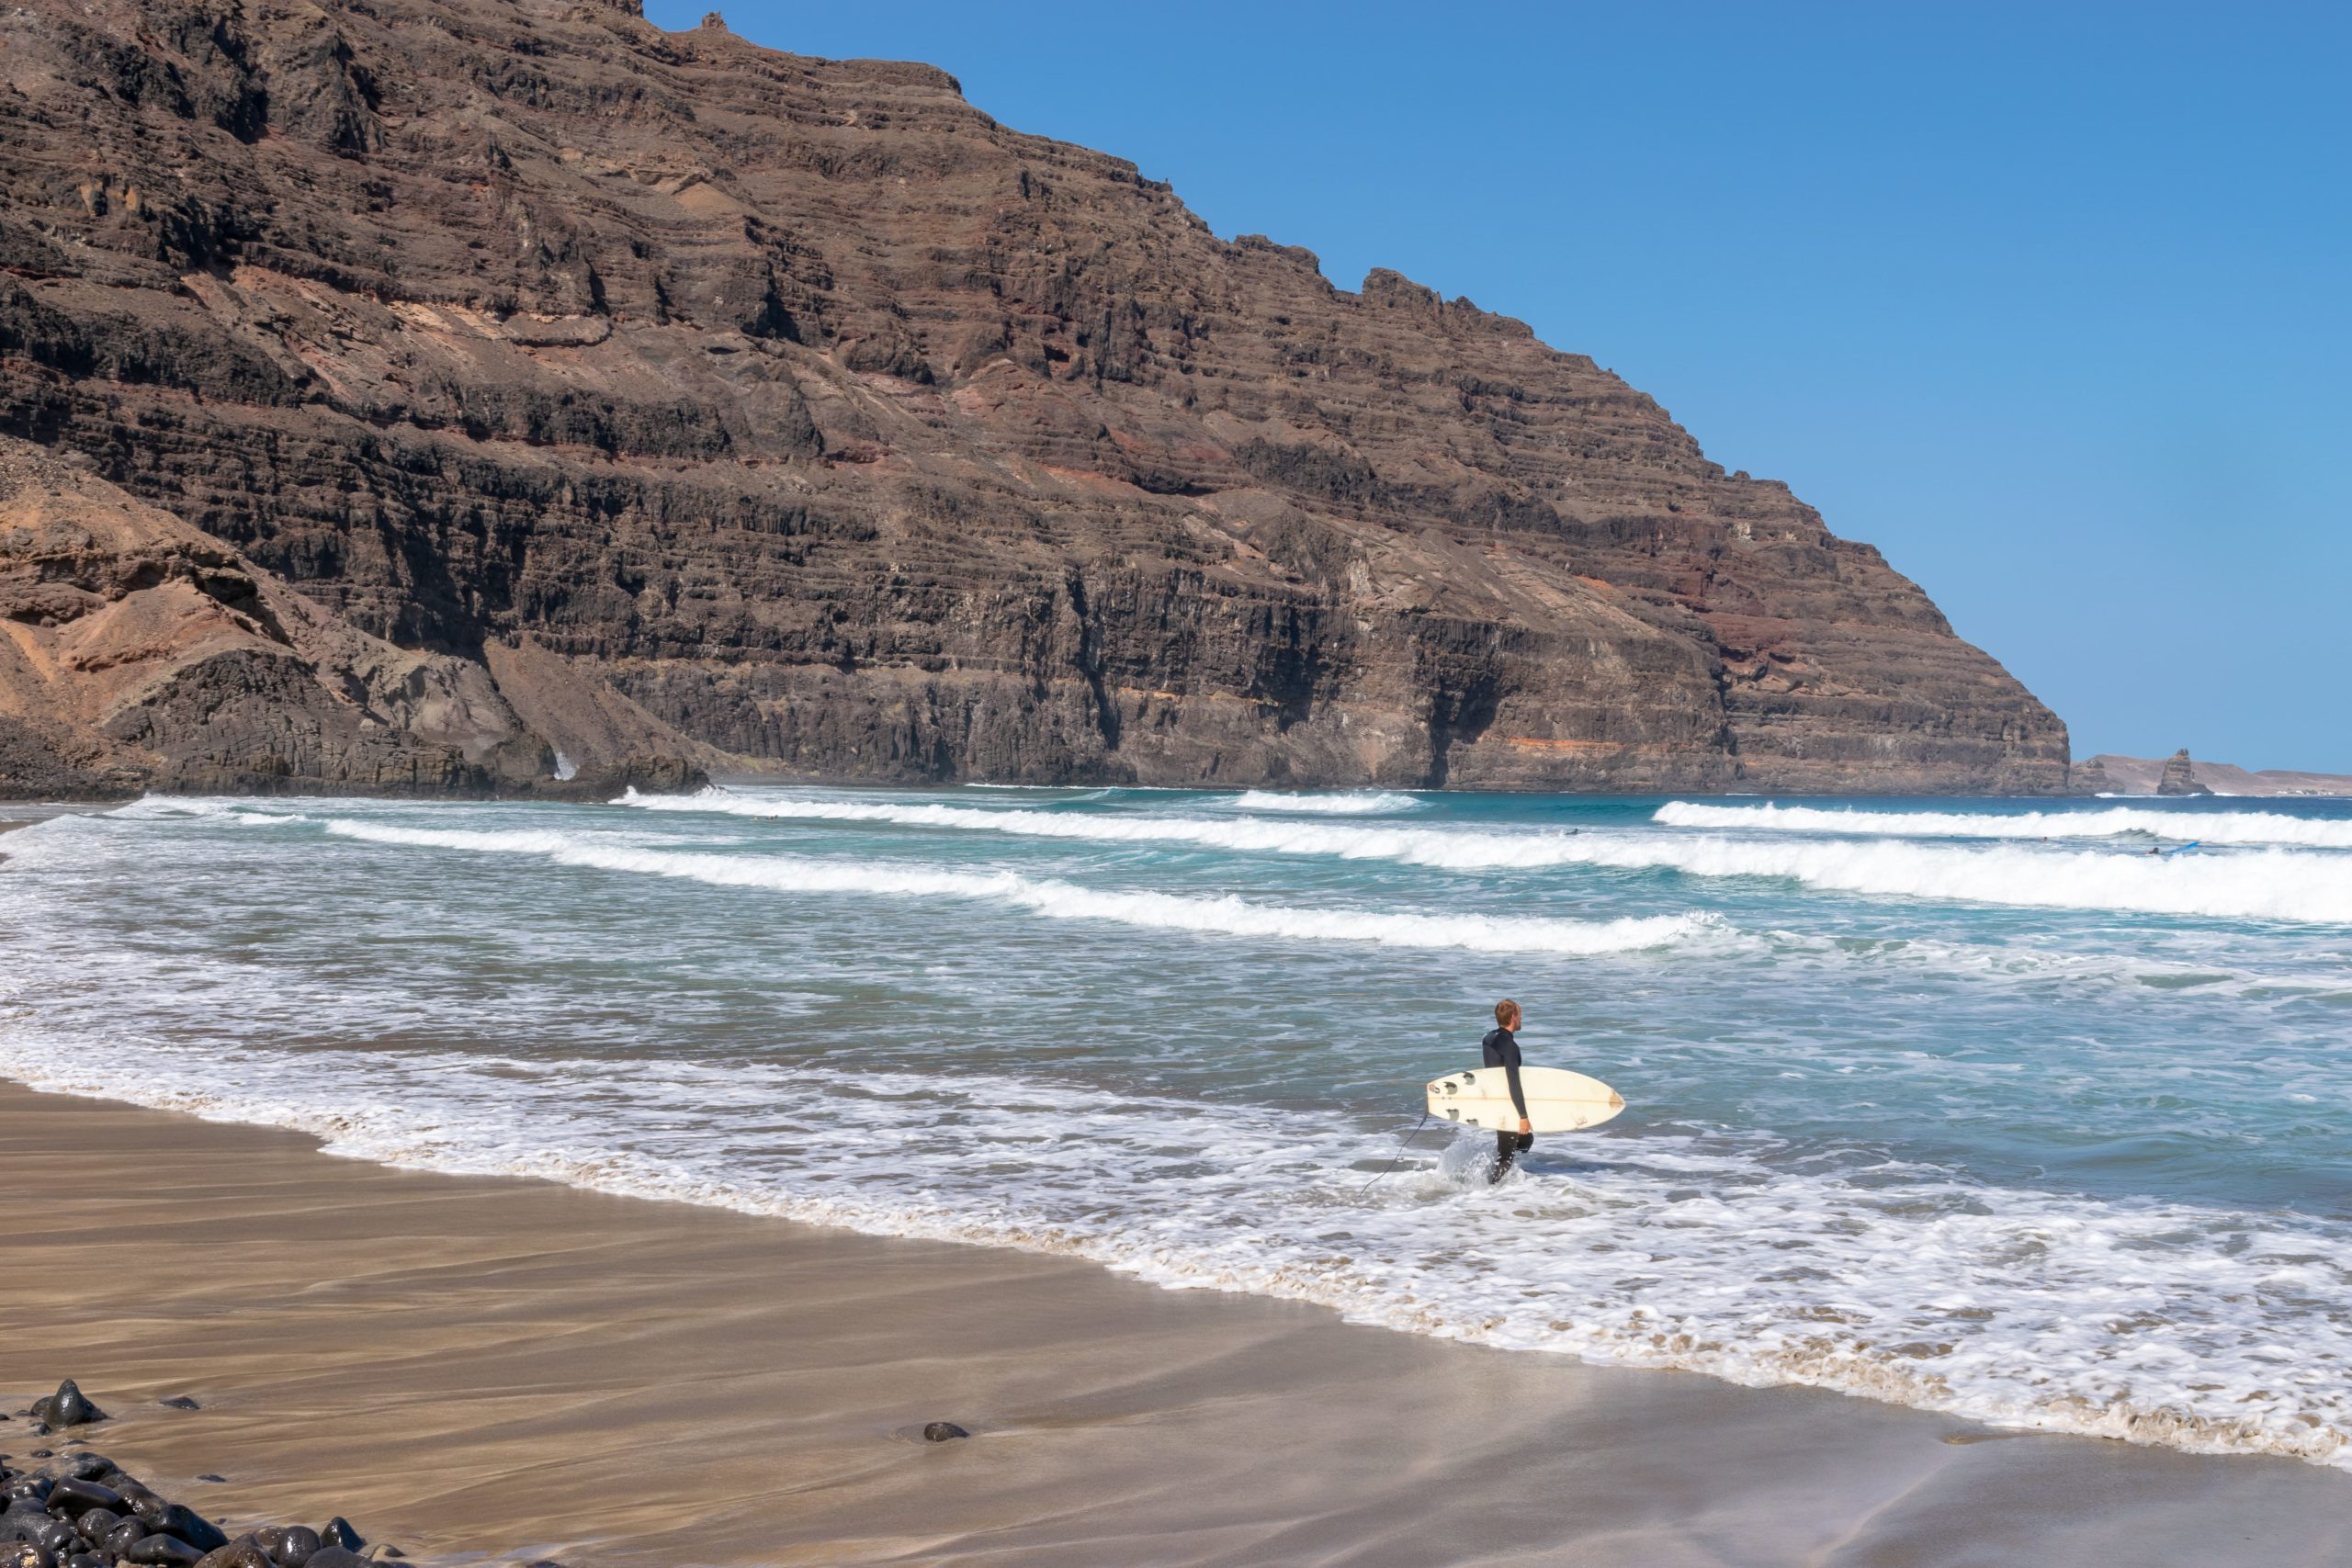 Surfing Lanzarote - Orzola